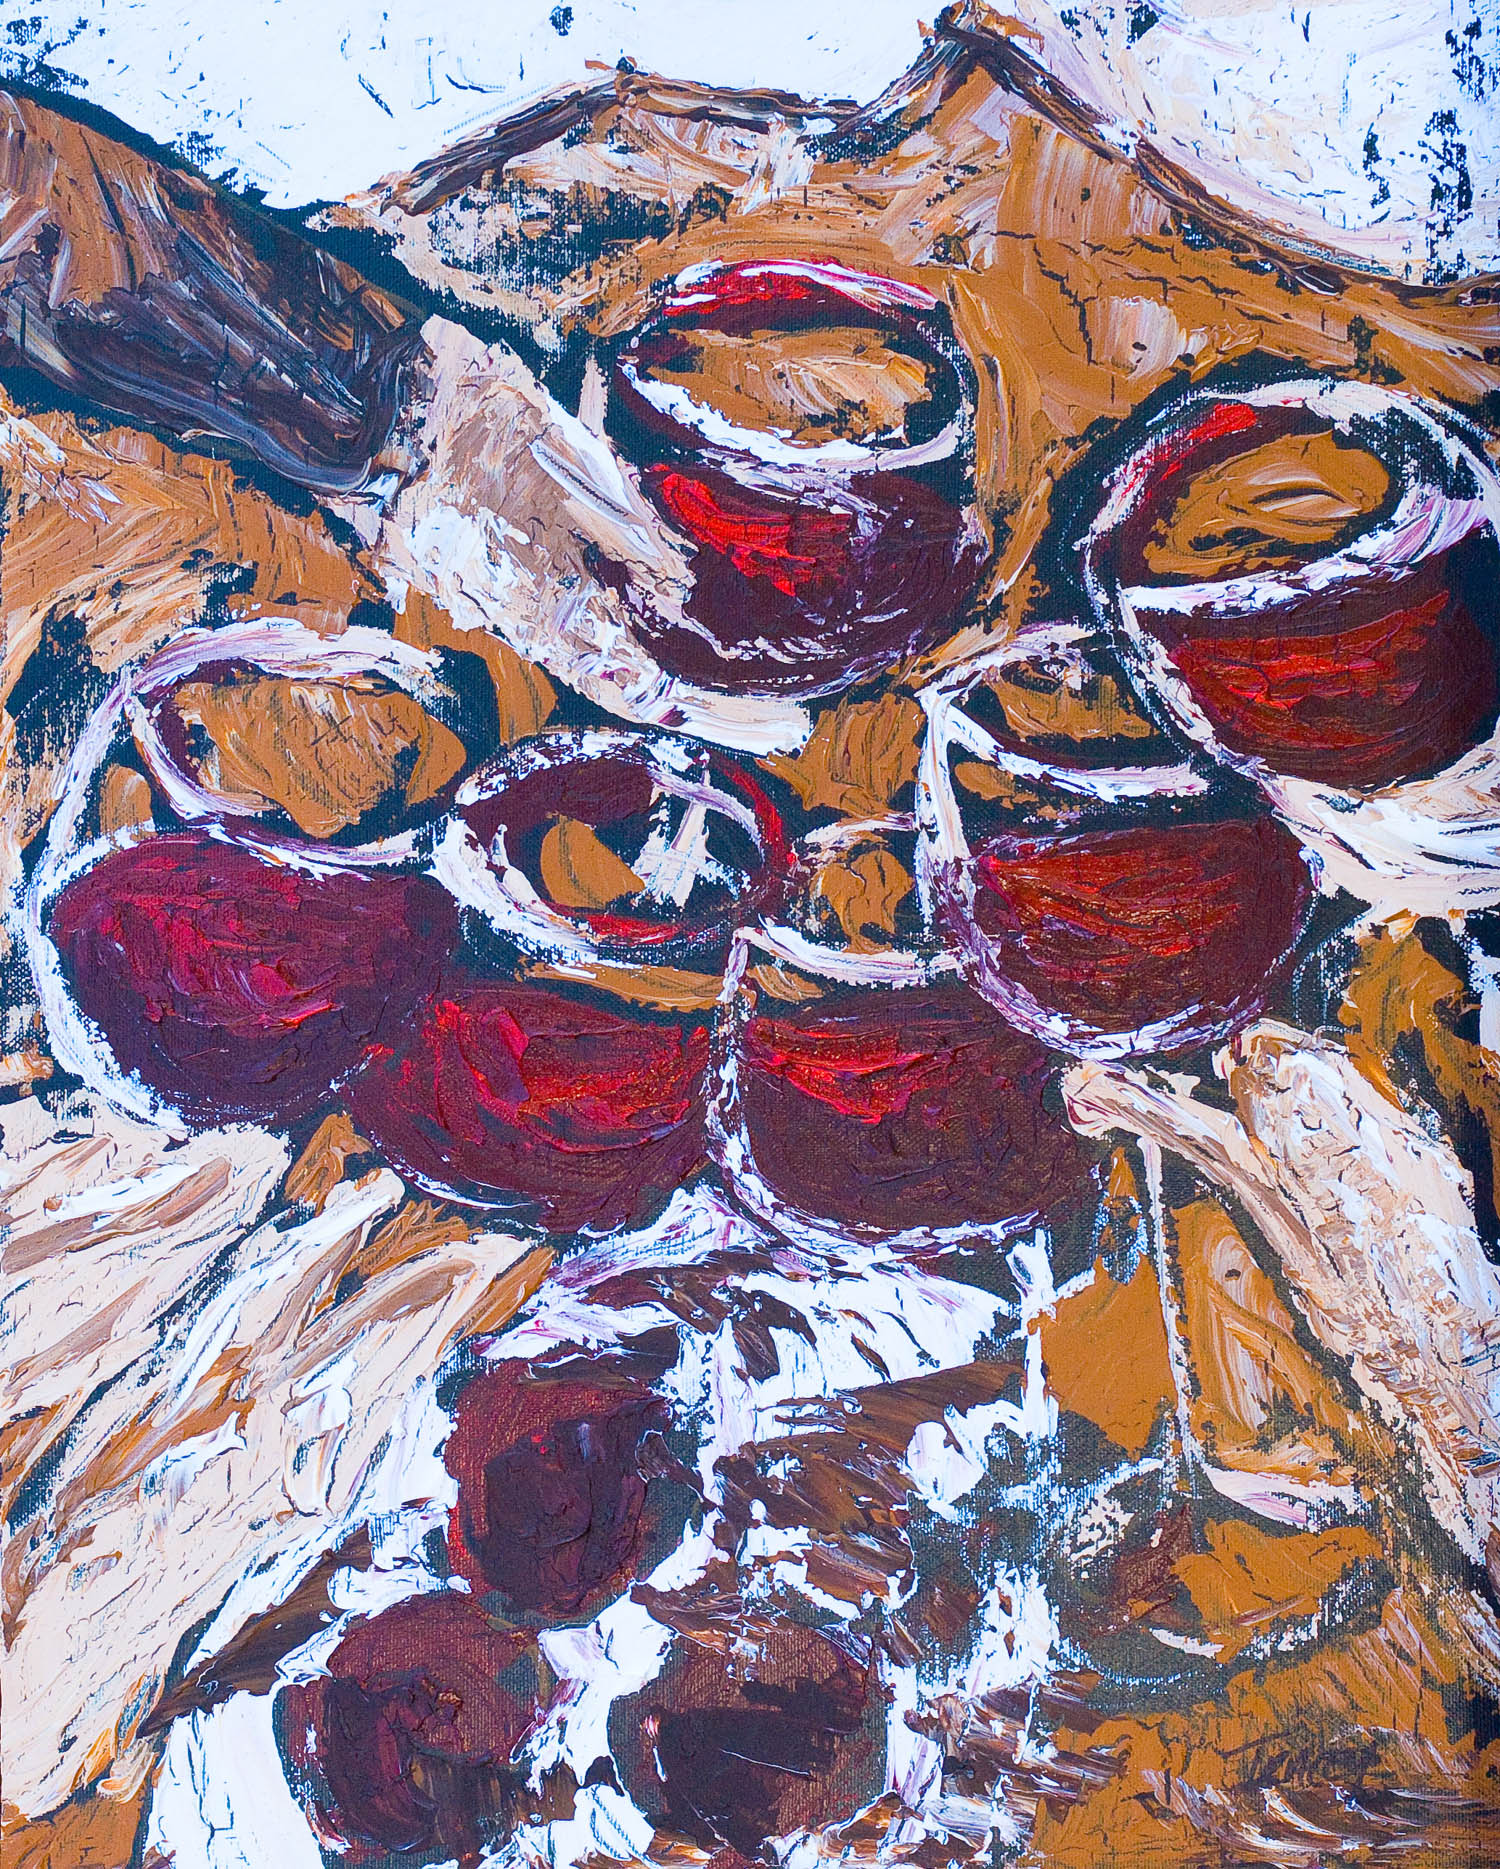 tracey-j-marshall-wine-food-washes-486.jpg